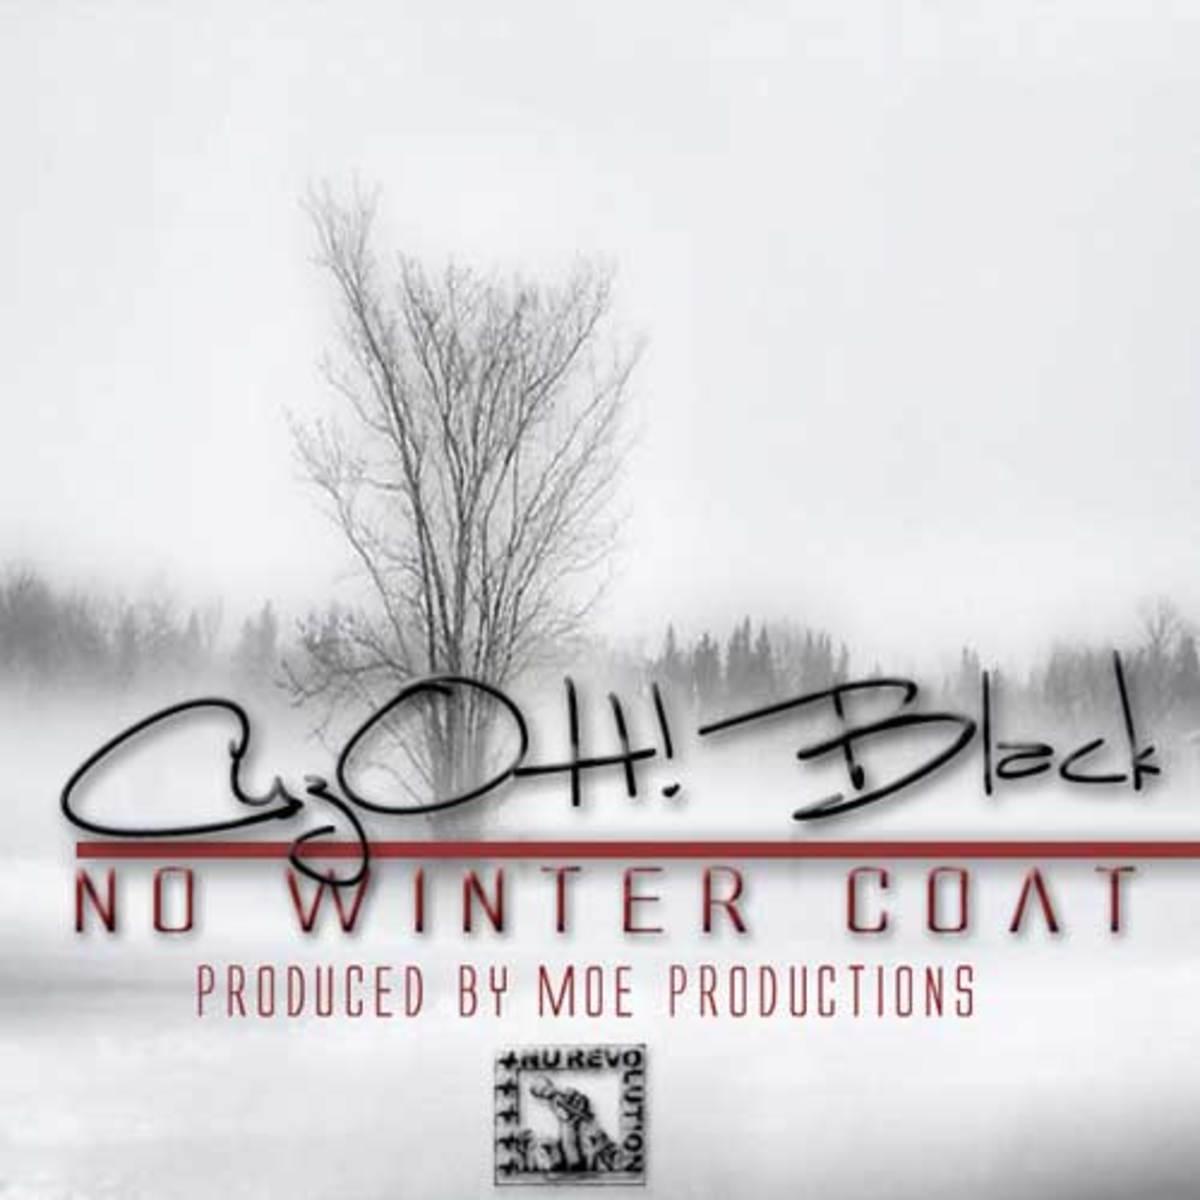 cuzohblack-coat.jpg